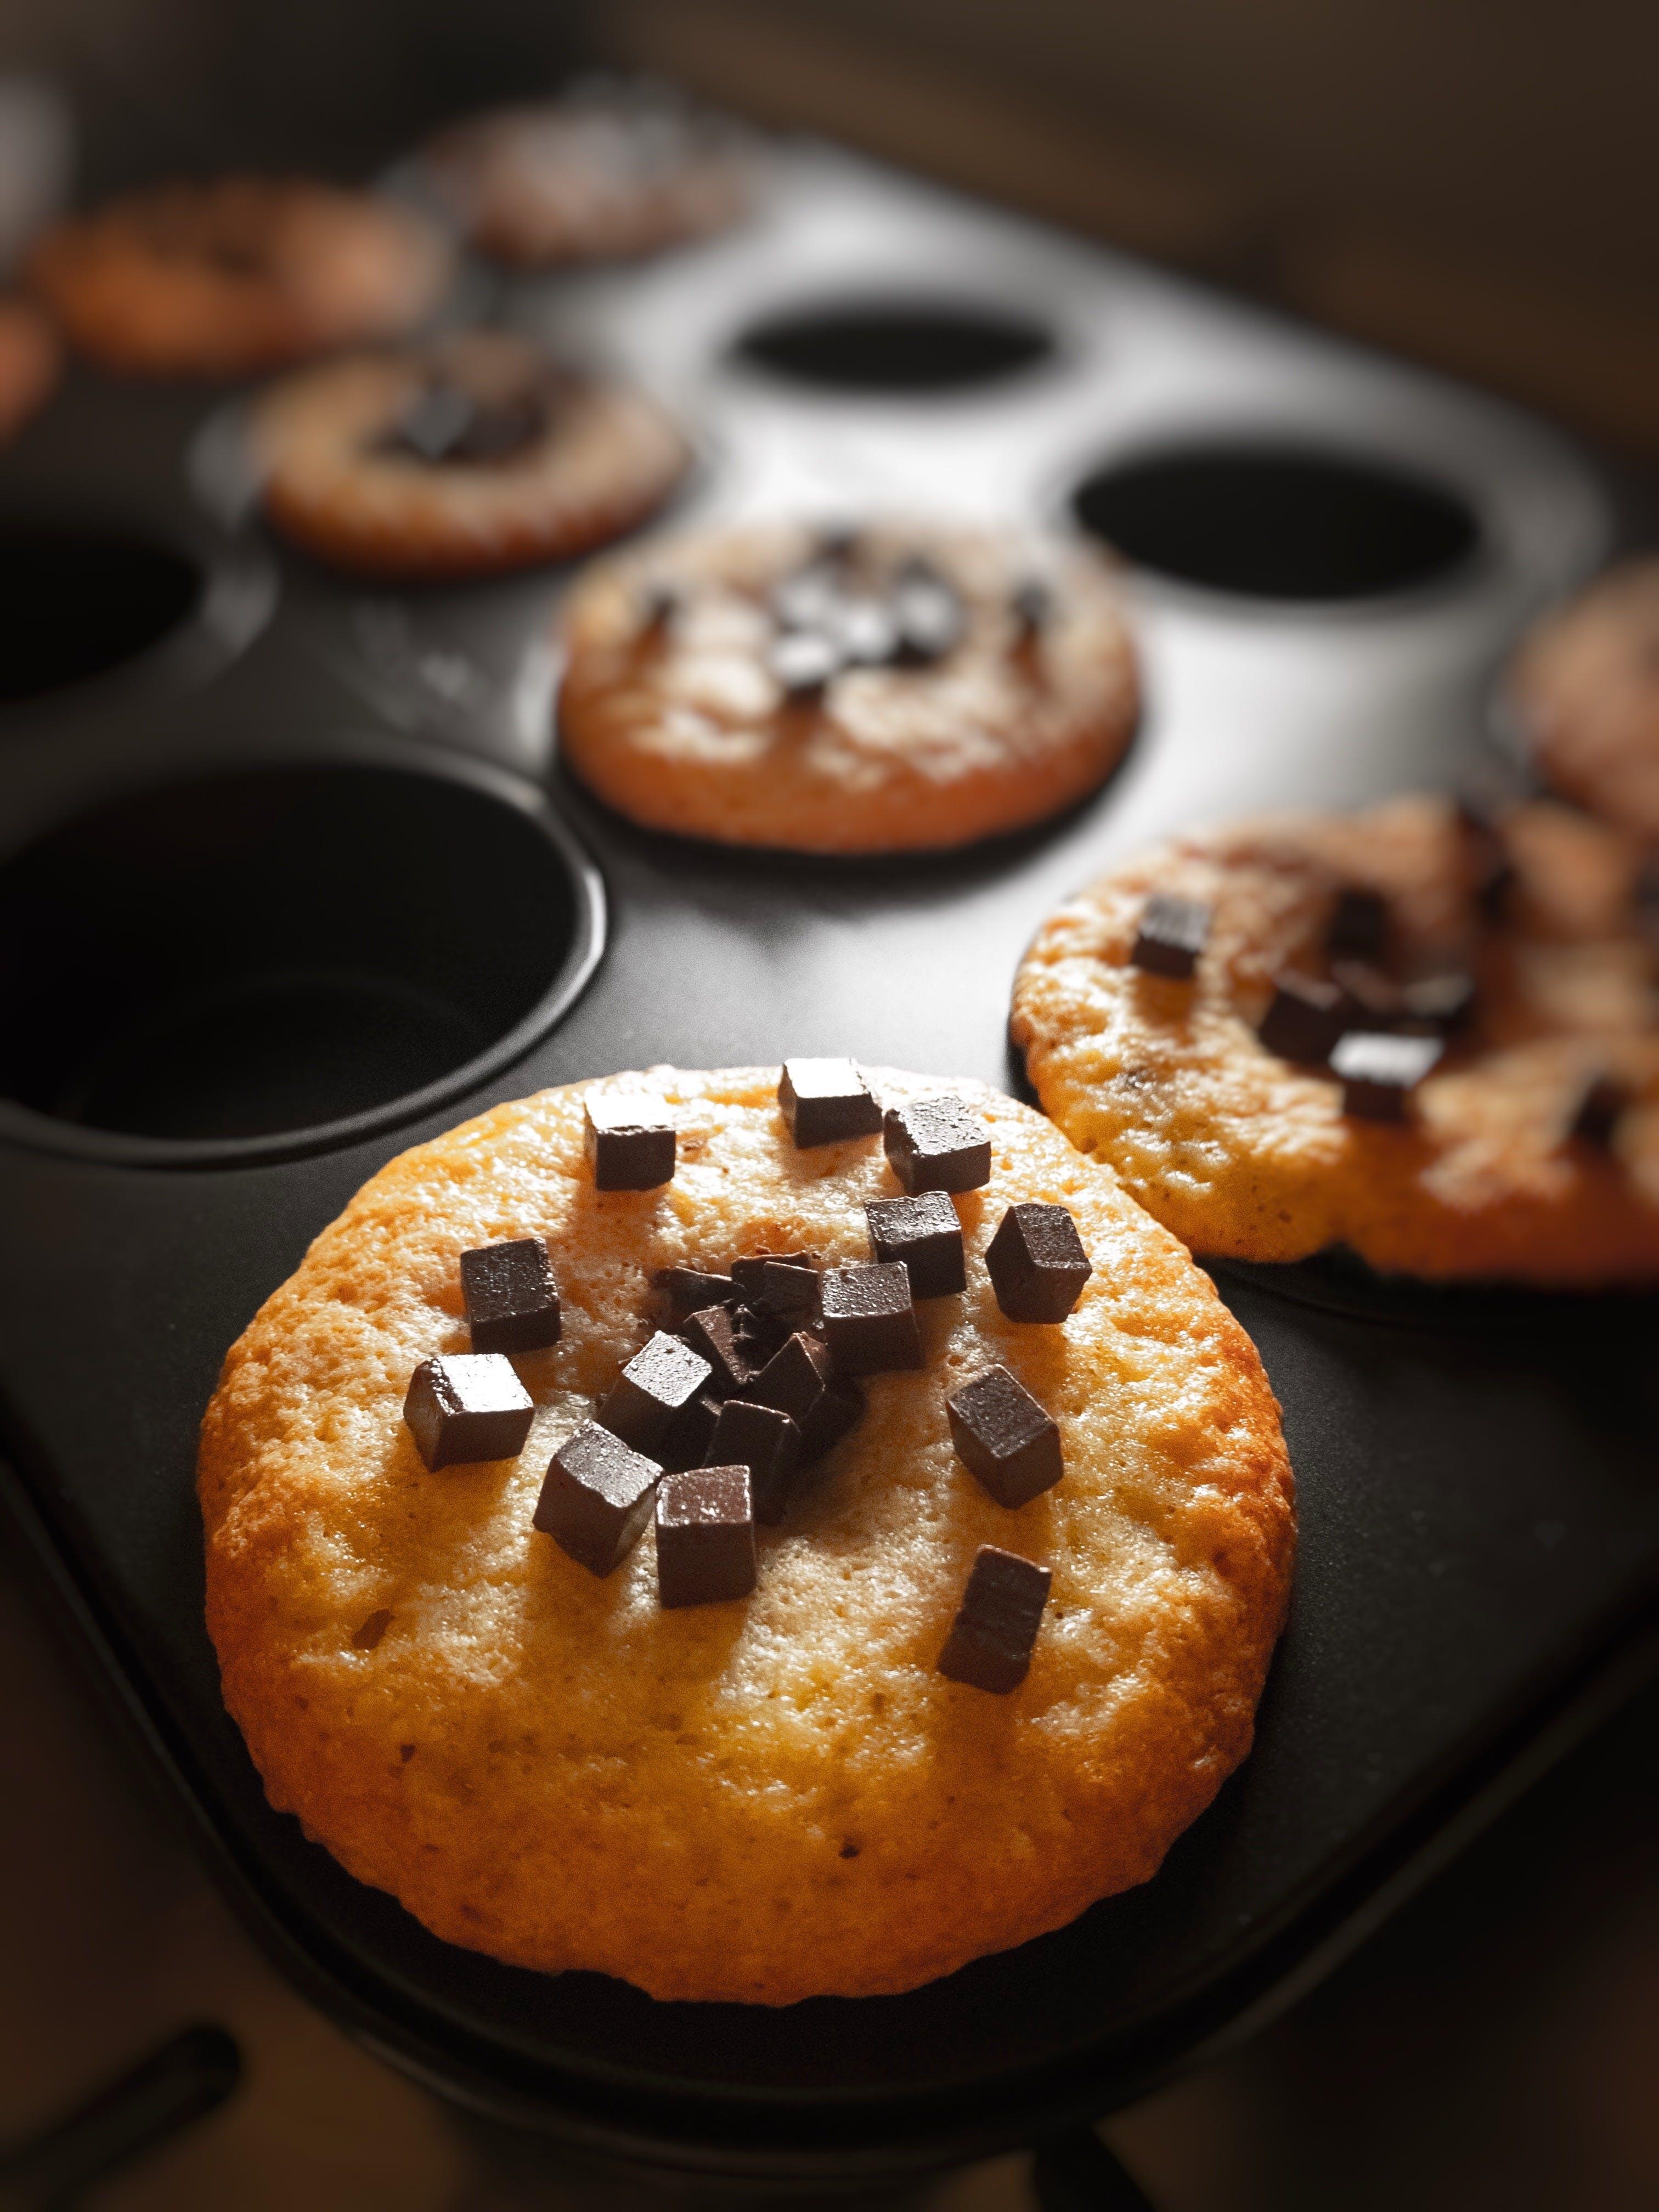 Gratis lagerfoto af bage, bageri, bagt, brun